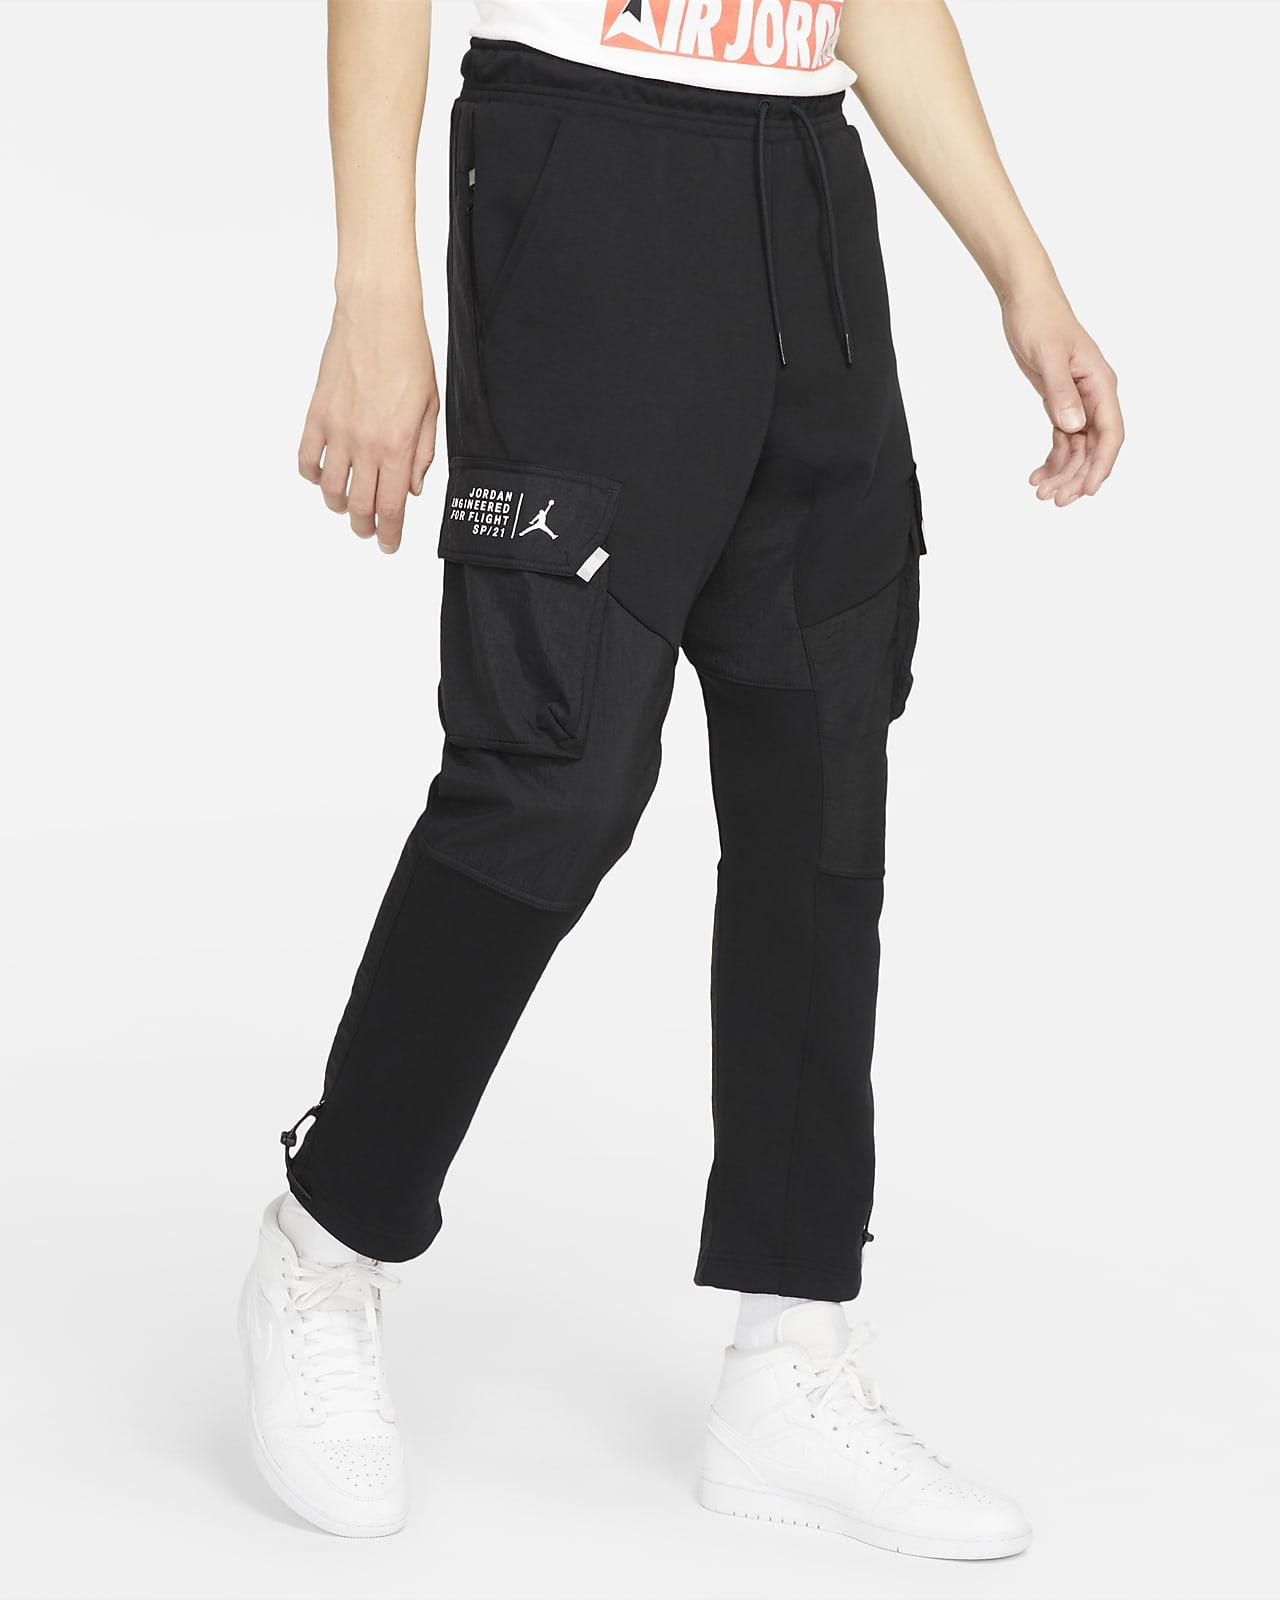 Pantalon en tissu Fleece Jordan 23 Engineered pour Homme